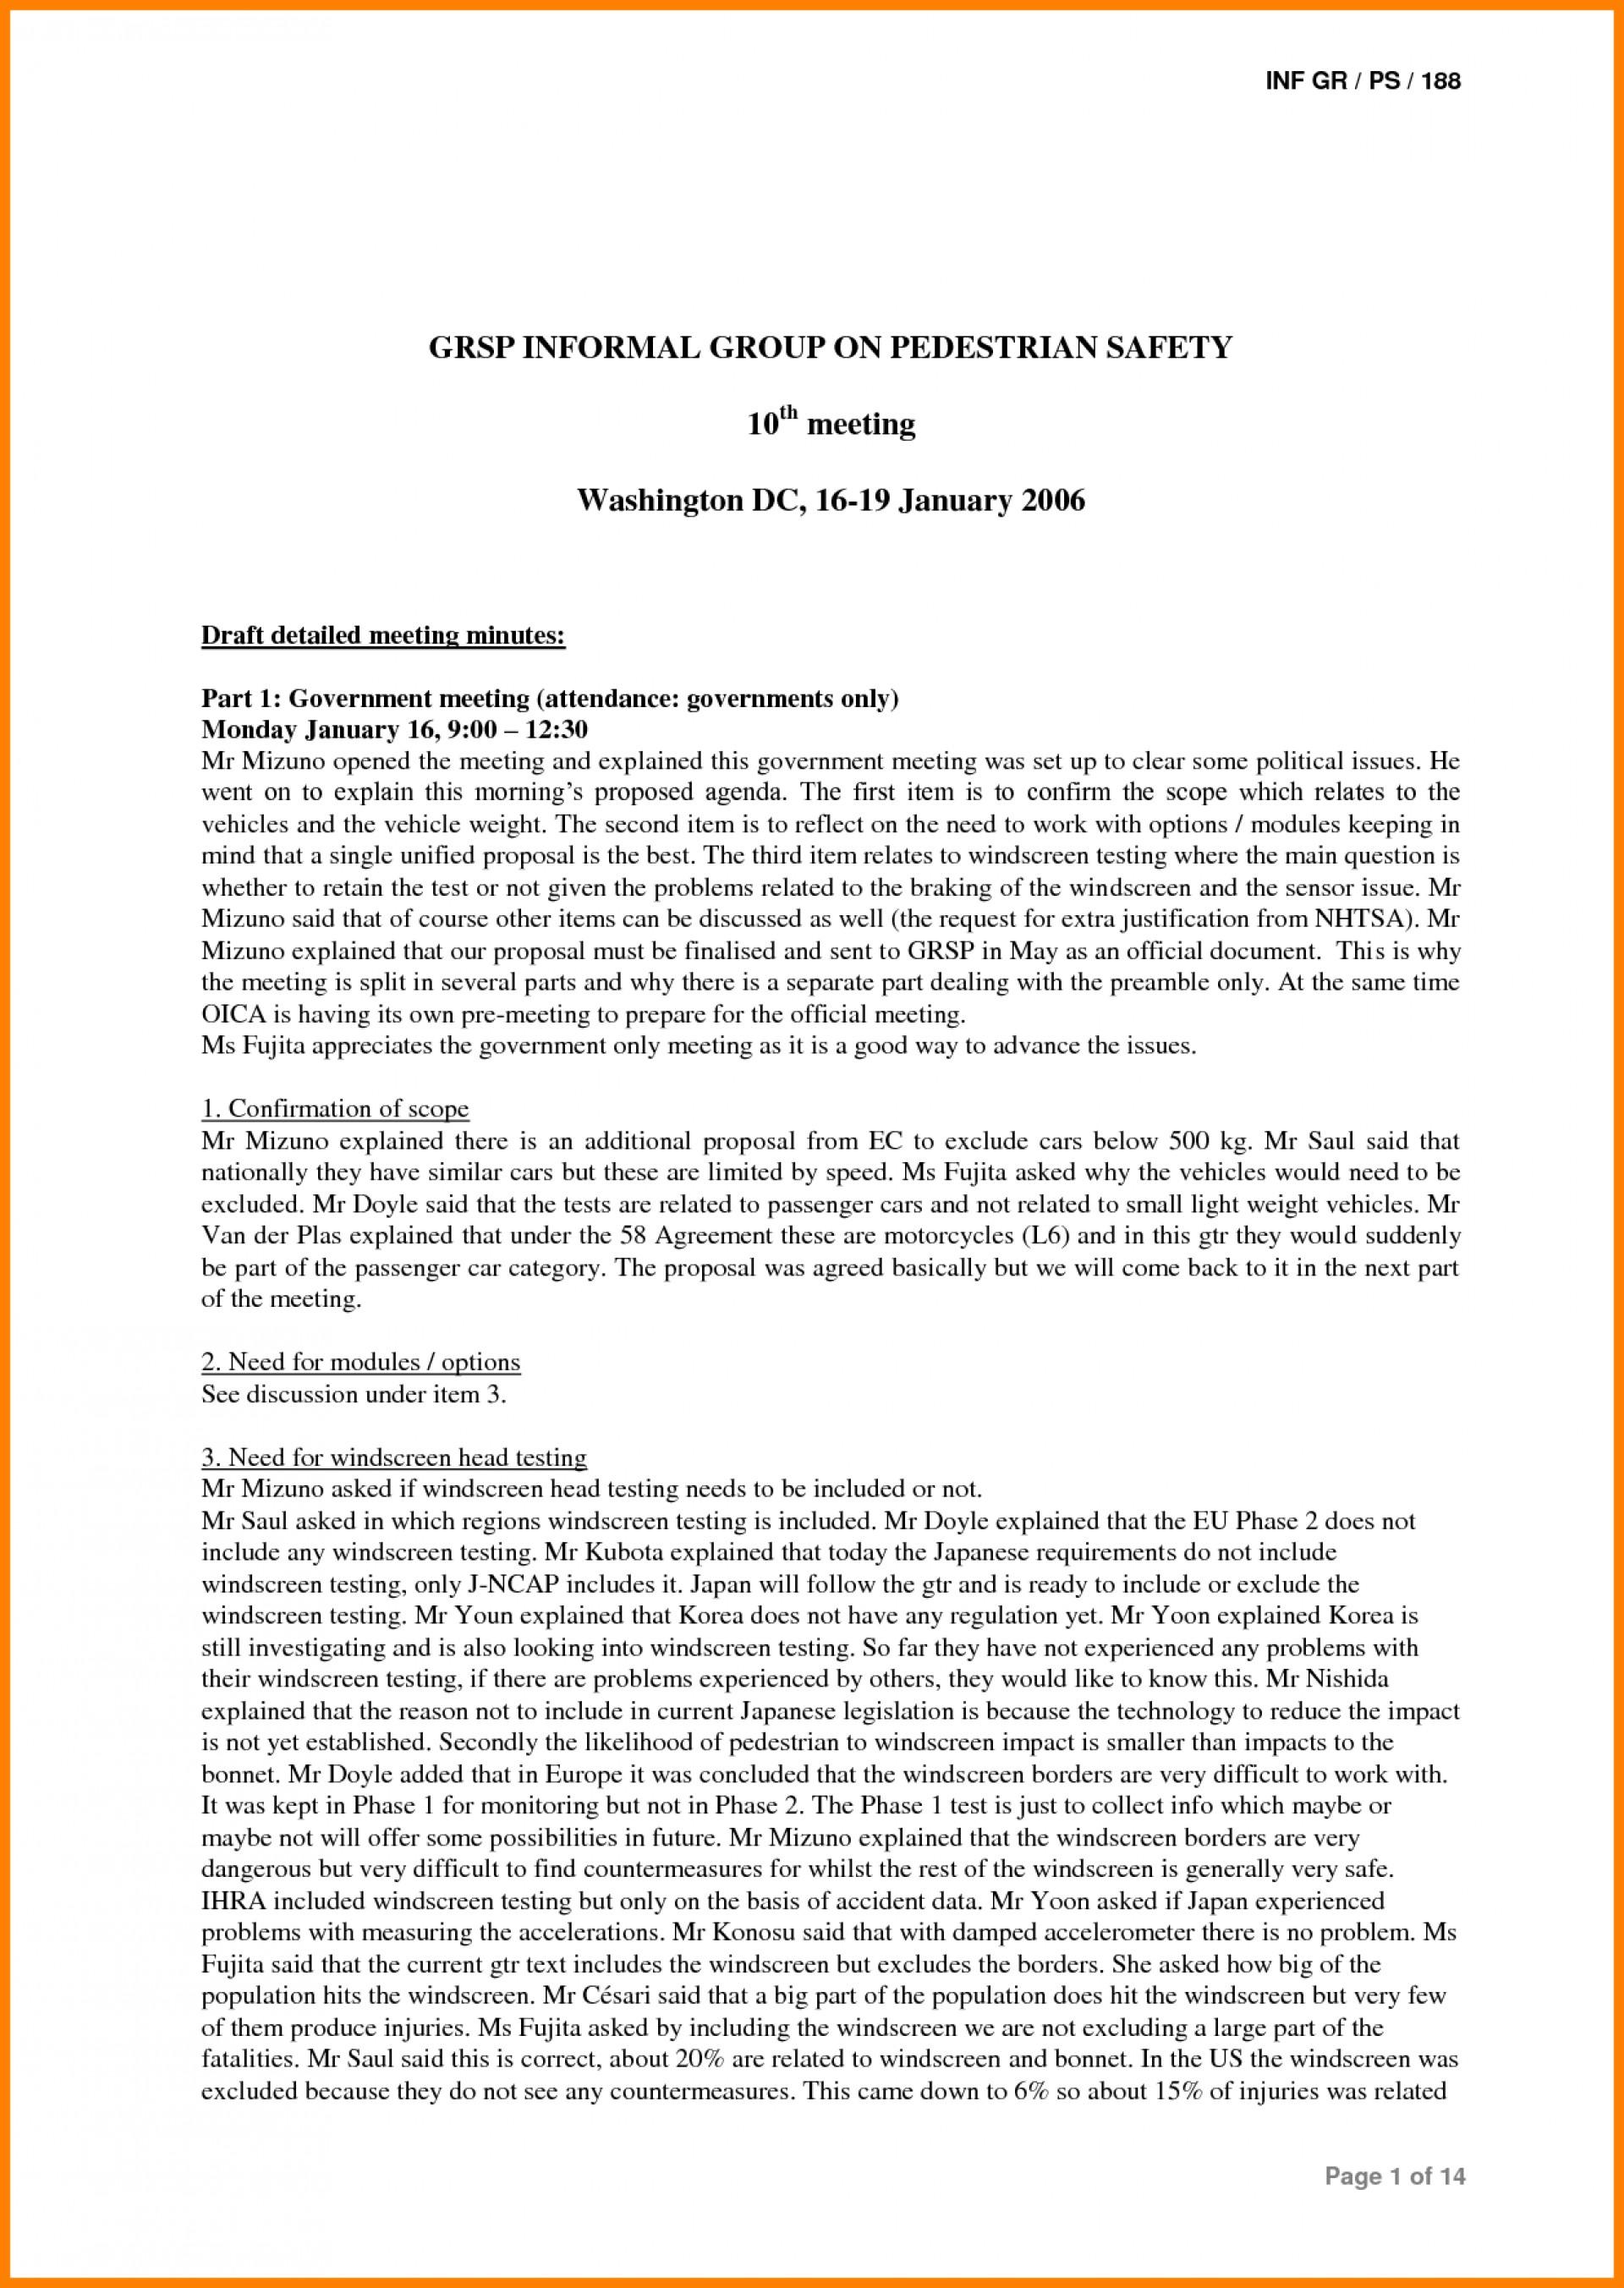 005 Usc Essays Essay Outstanding Supplemental Tips Mba Sample Engineering 1920